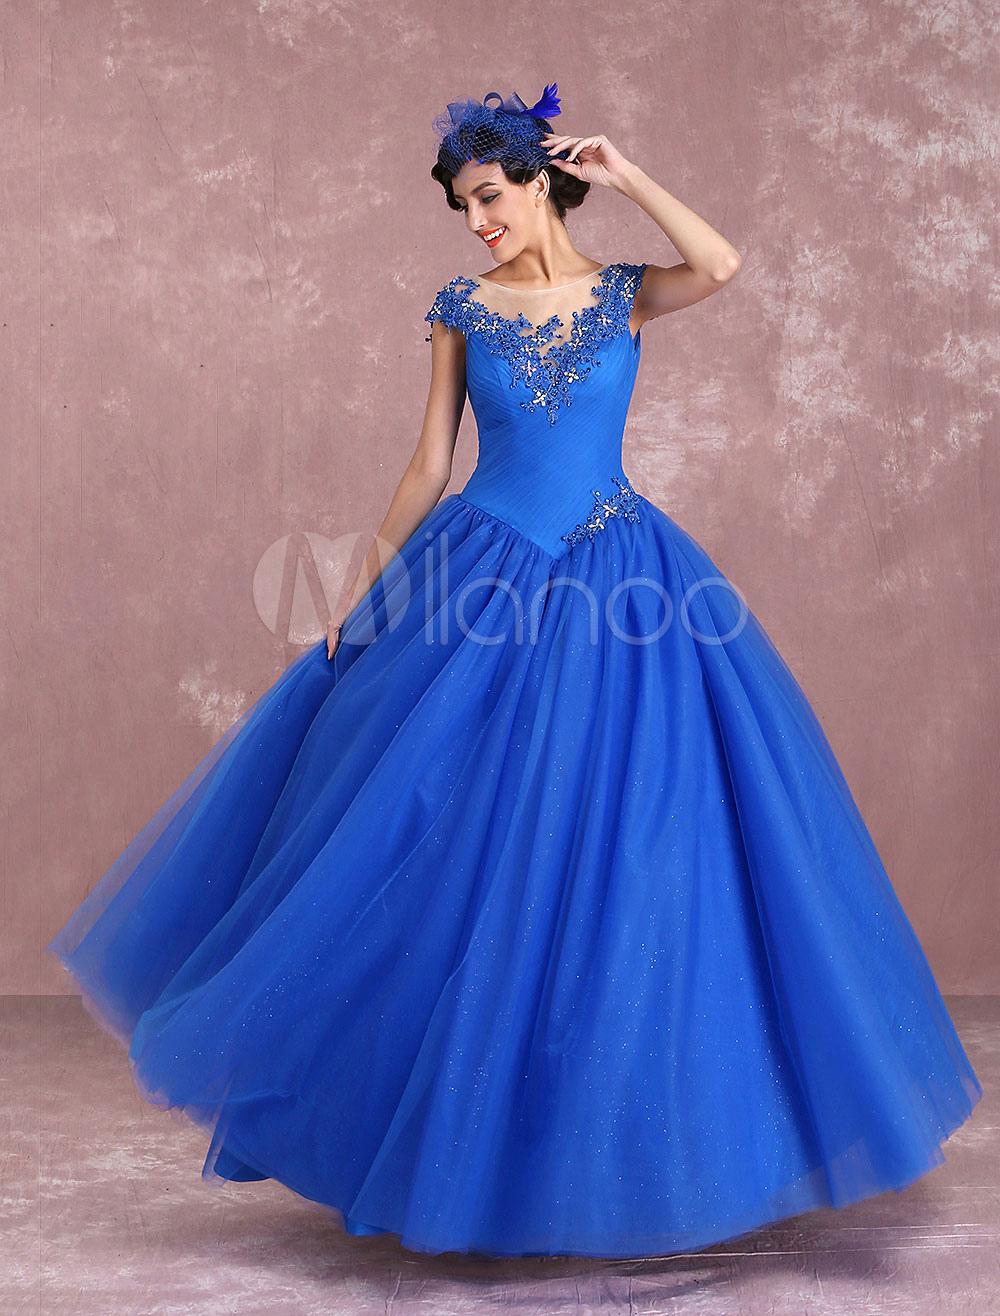 Princess Wedding Dresses Royal Blue Tulle Bridal Gown Illusion Neck Lace Applique Beading Floor Length Bridal Dress Milanoo photo